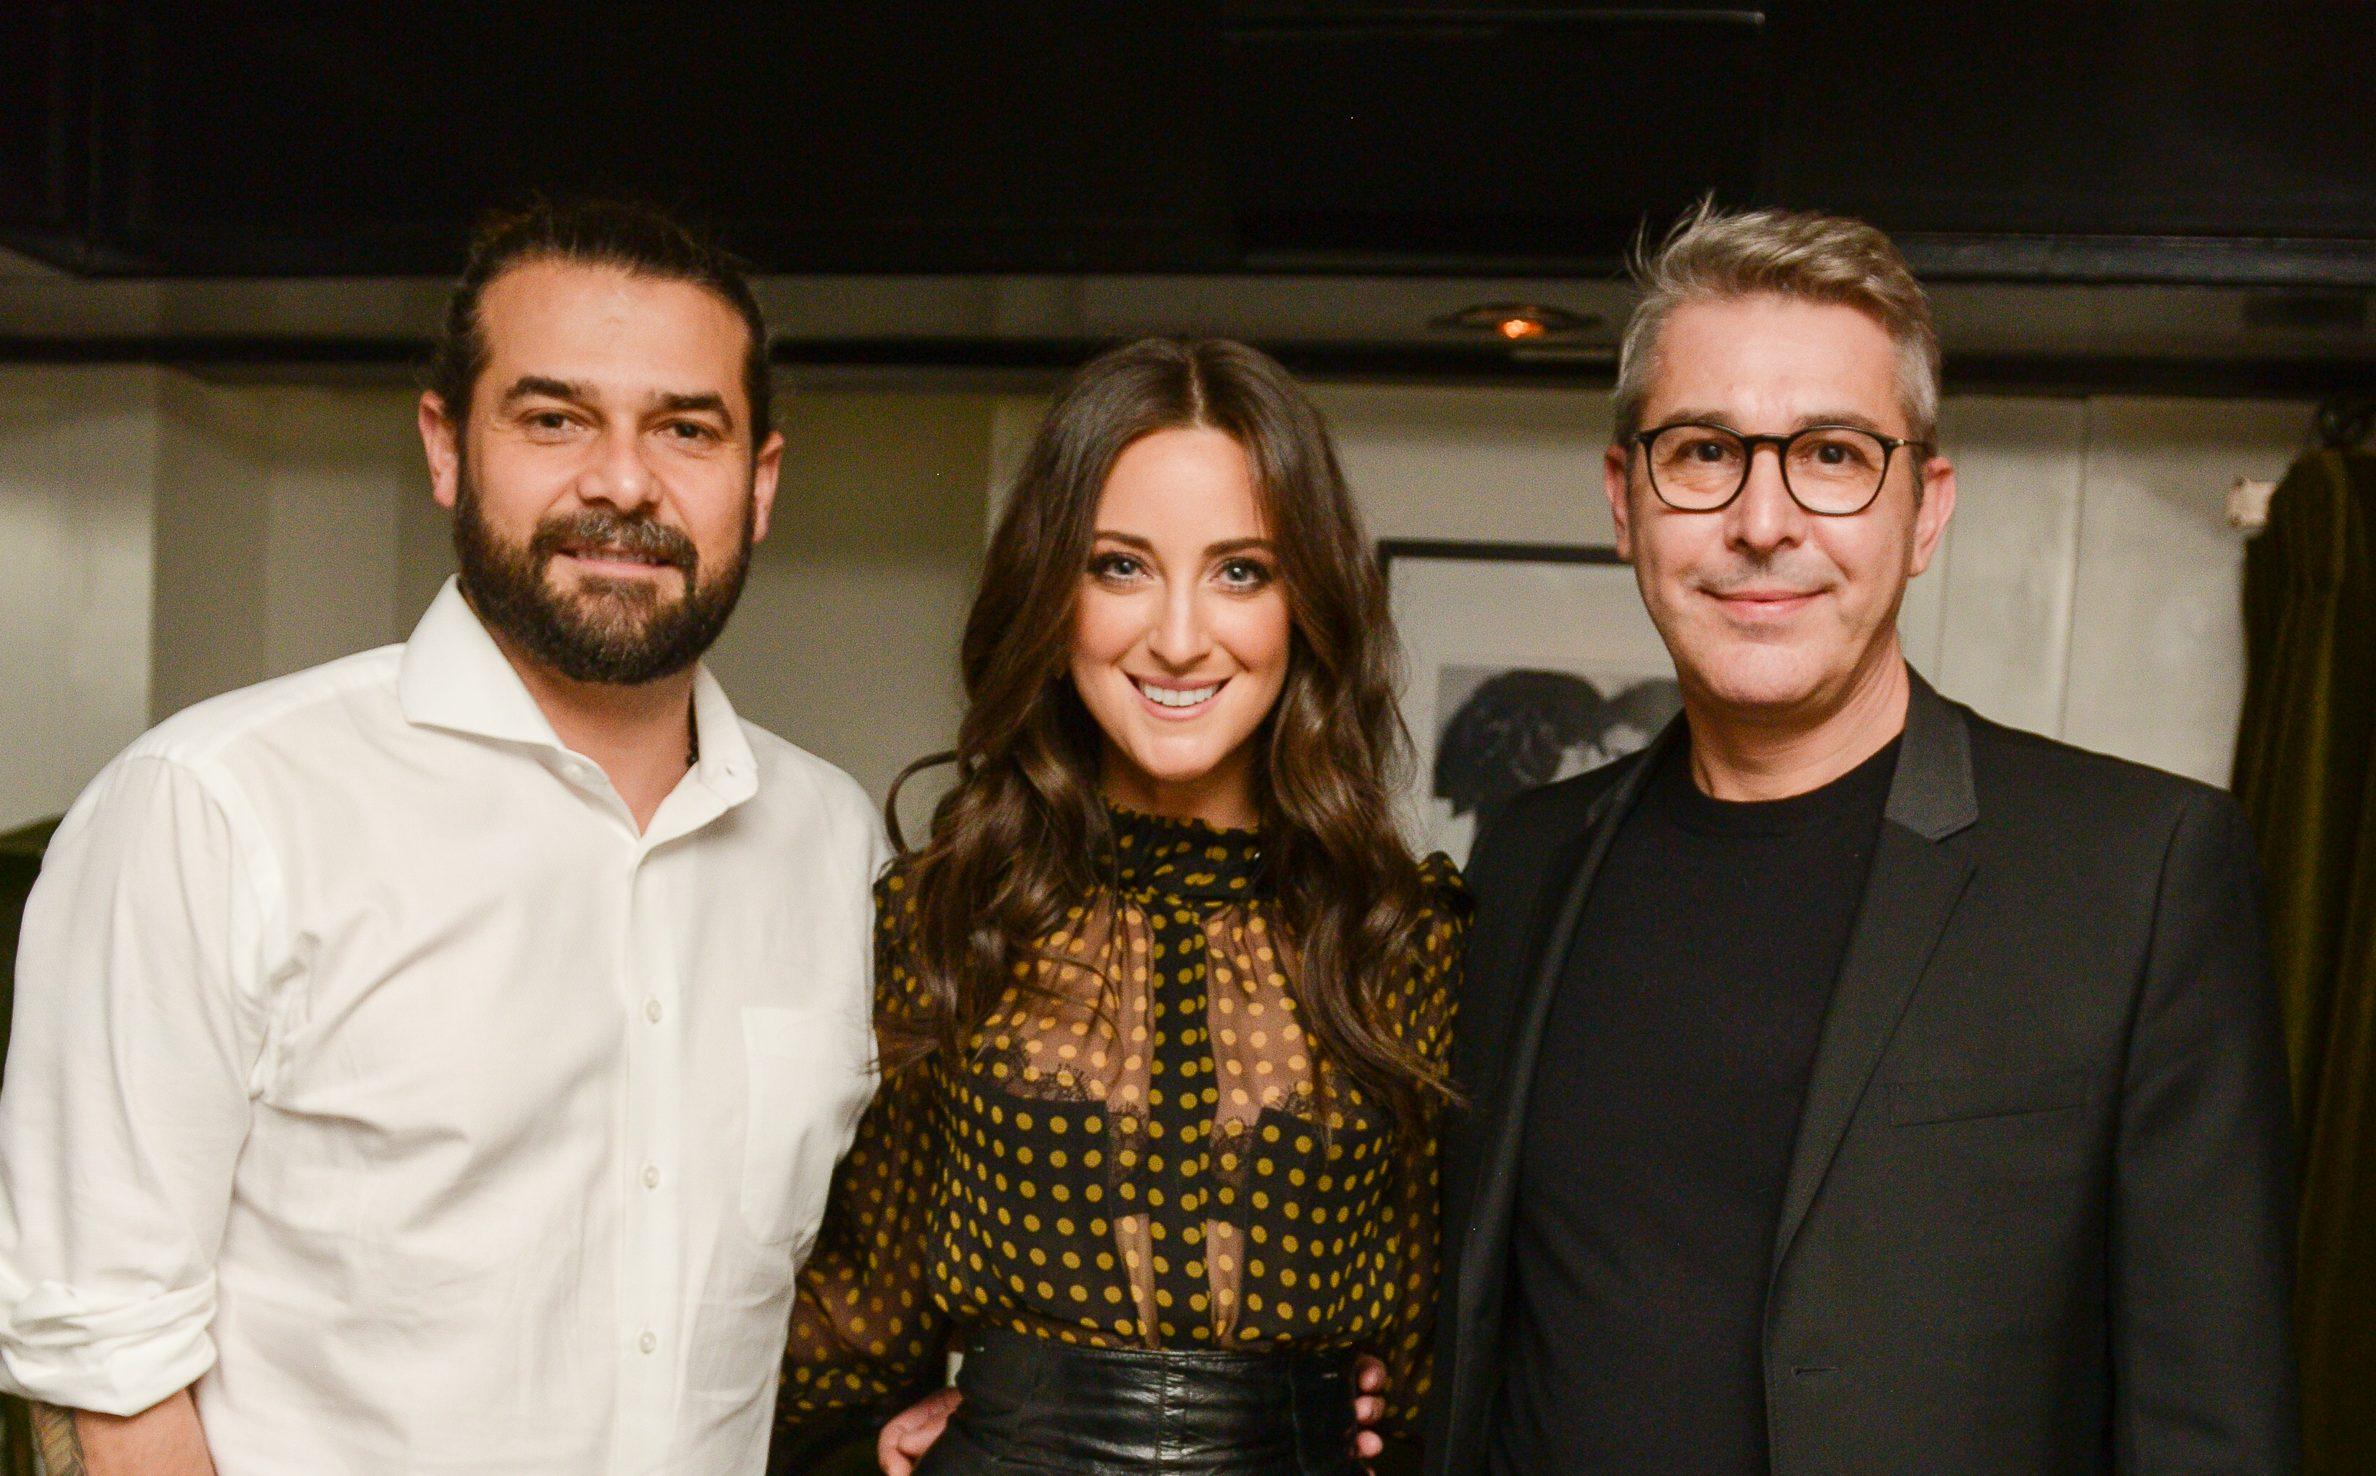 Sisco Sintes, Micaela Erlanger and Silvano Banfi.